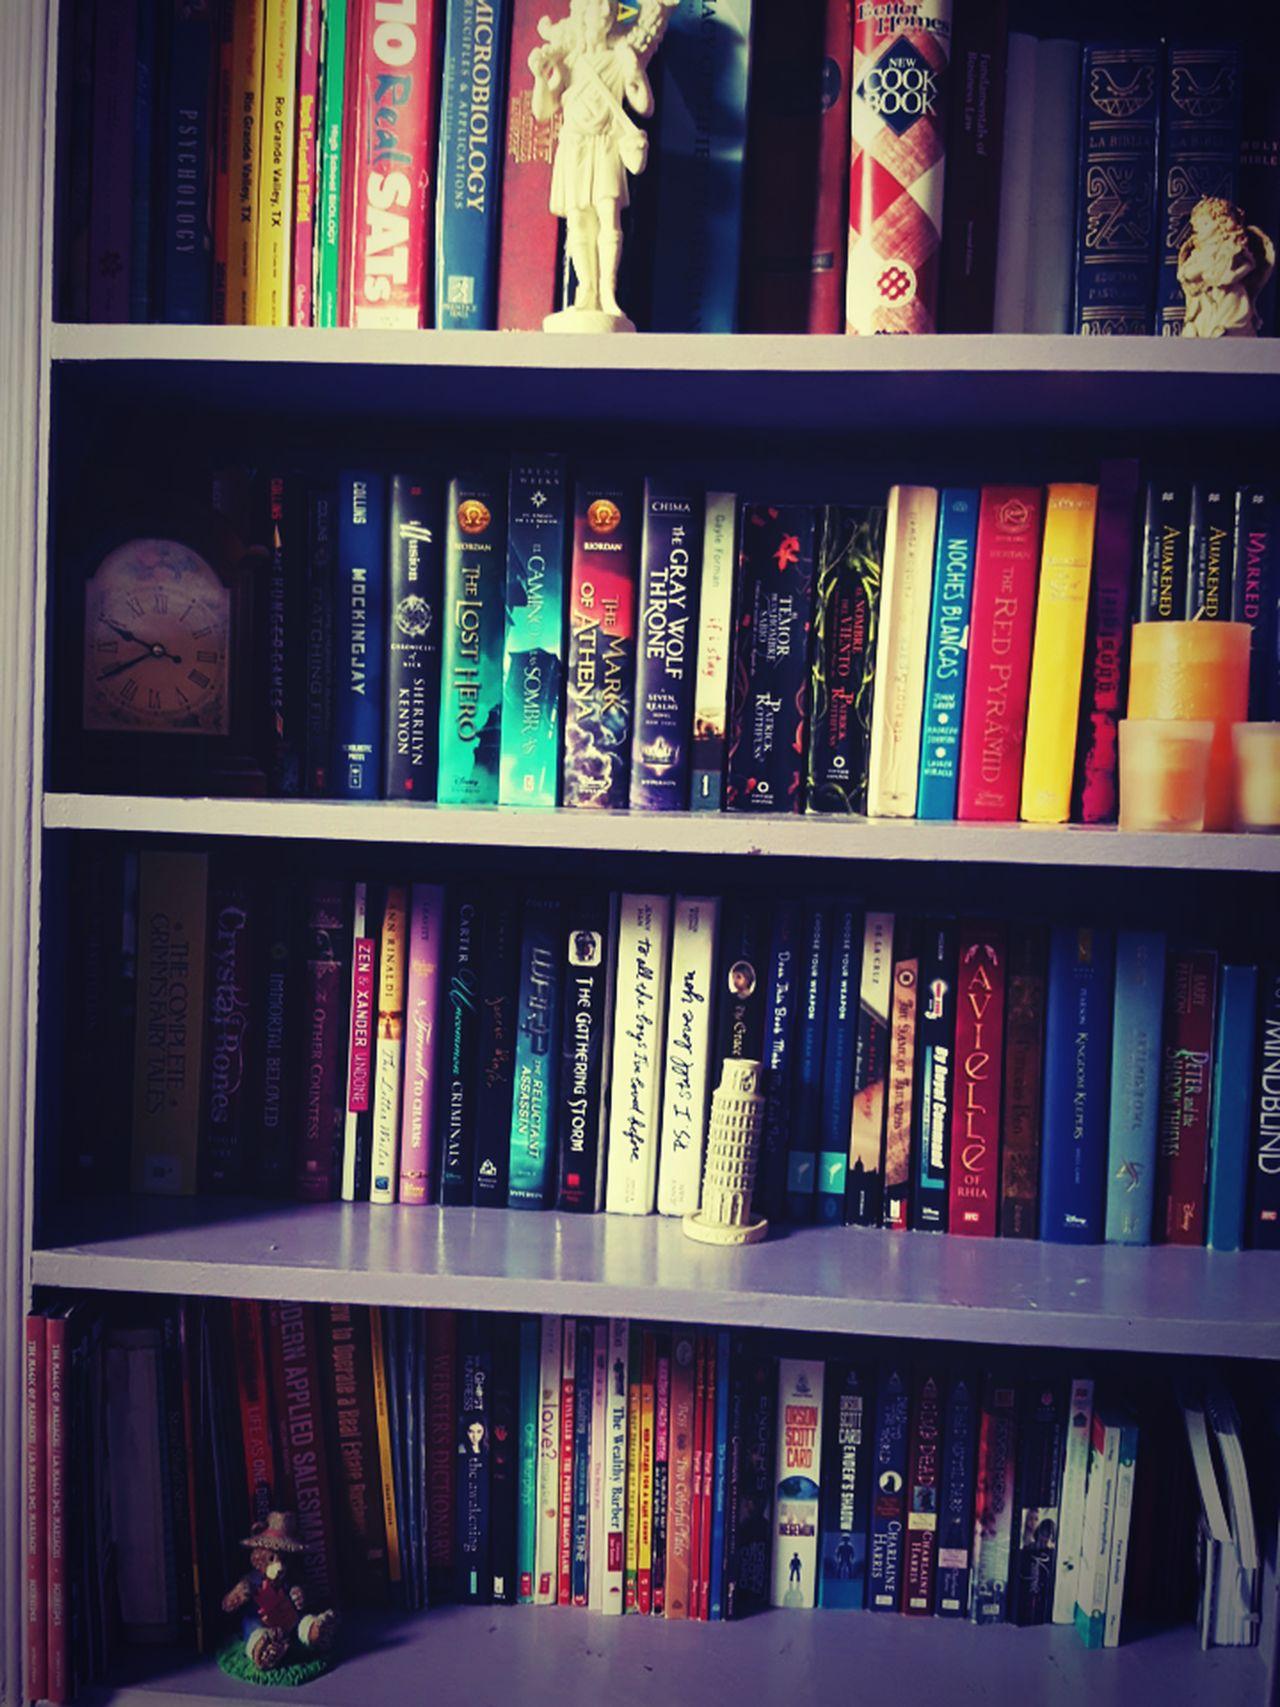 LostHero Monkingjay Libary Book Books Spanishbooks Kvothe Hungergames Sat